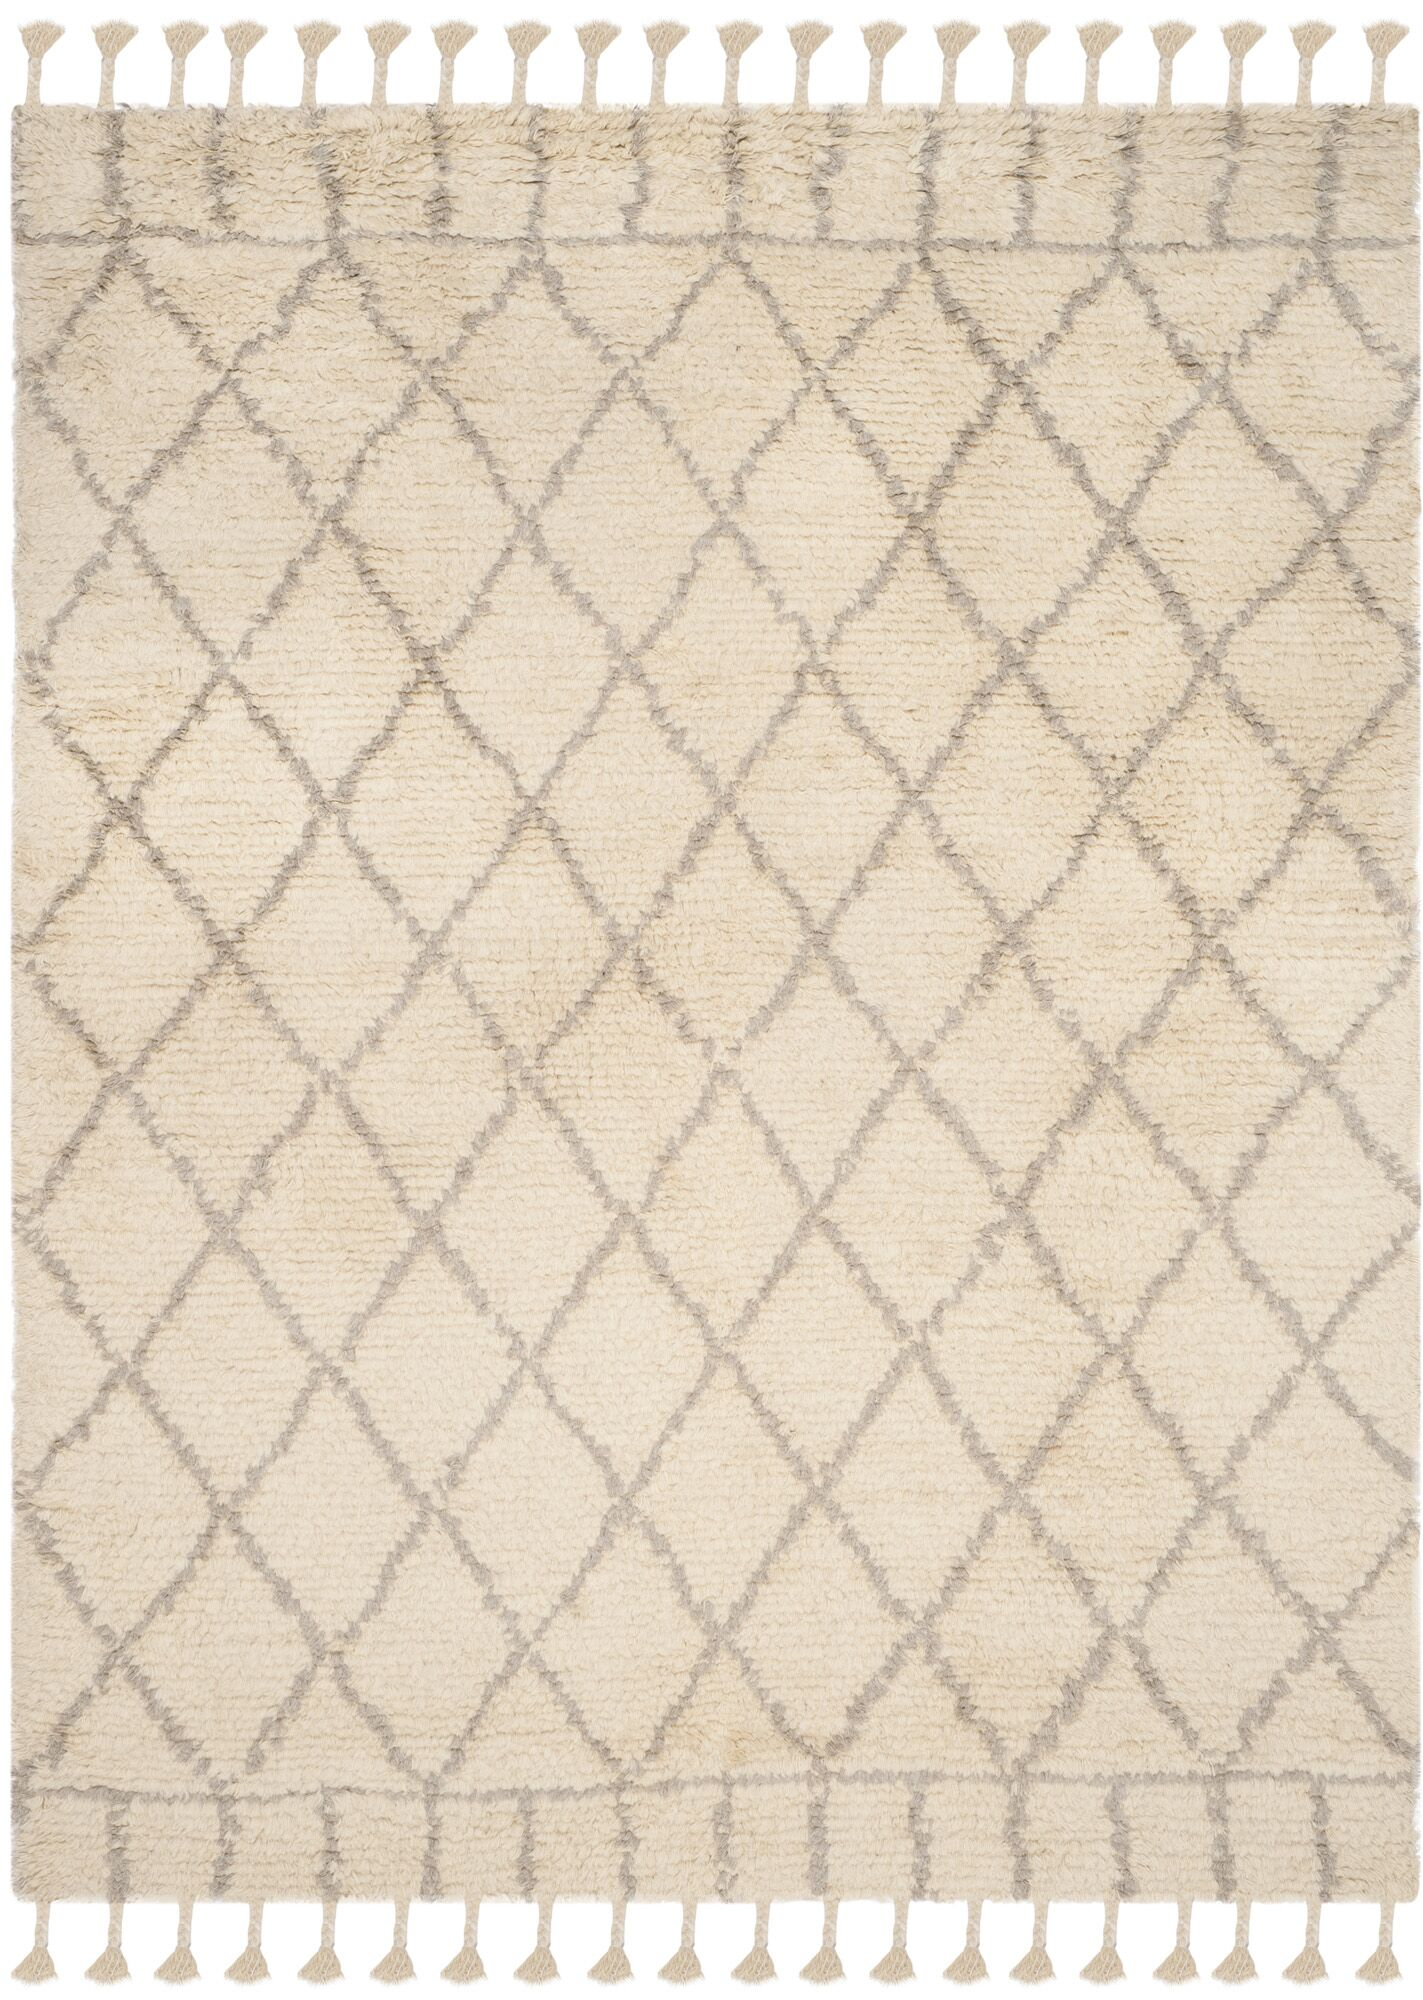 Livingston Hand-Tufted Beige Area Rug Rug Size: Rectangle 8' x 10'